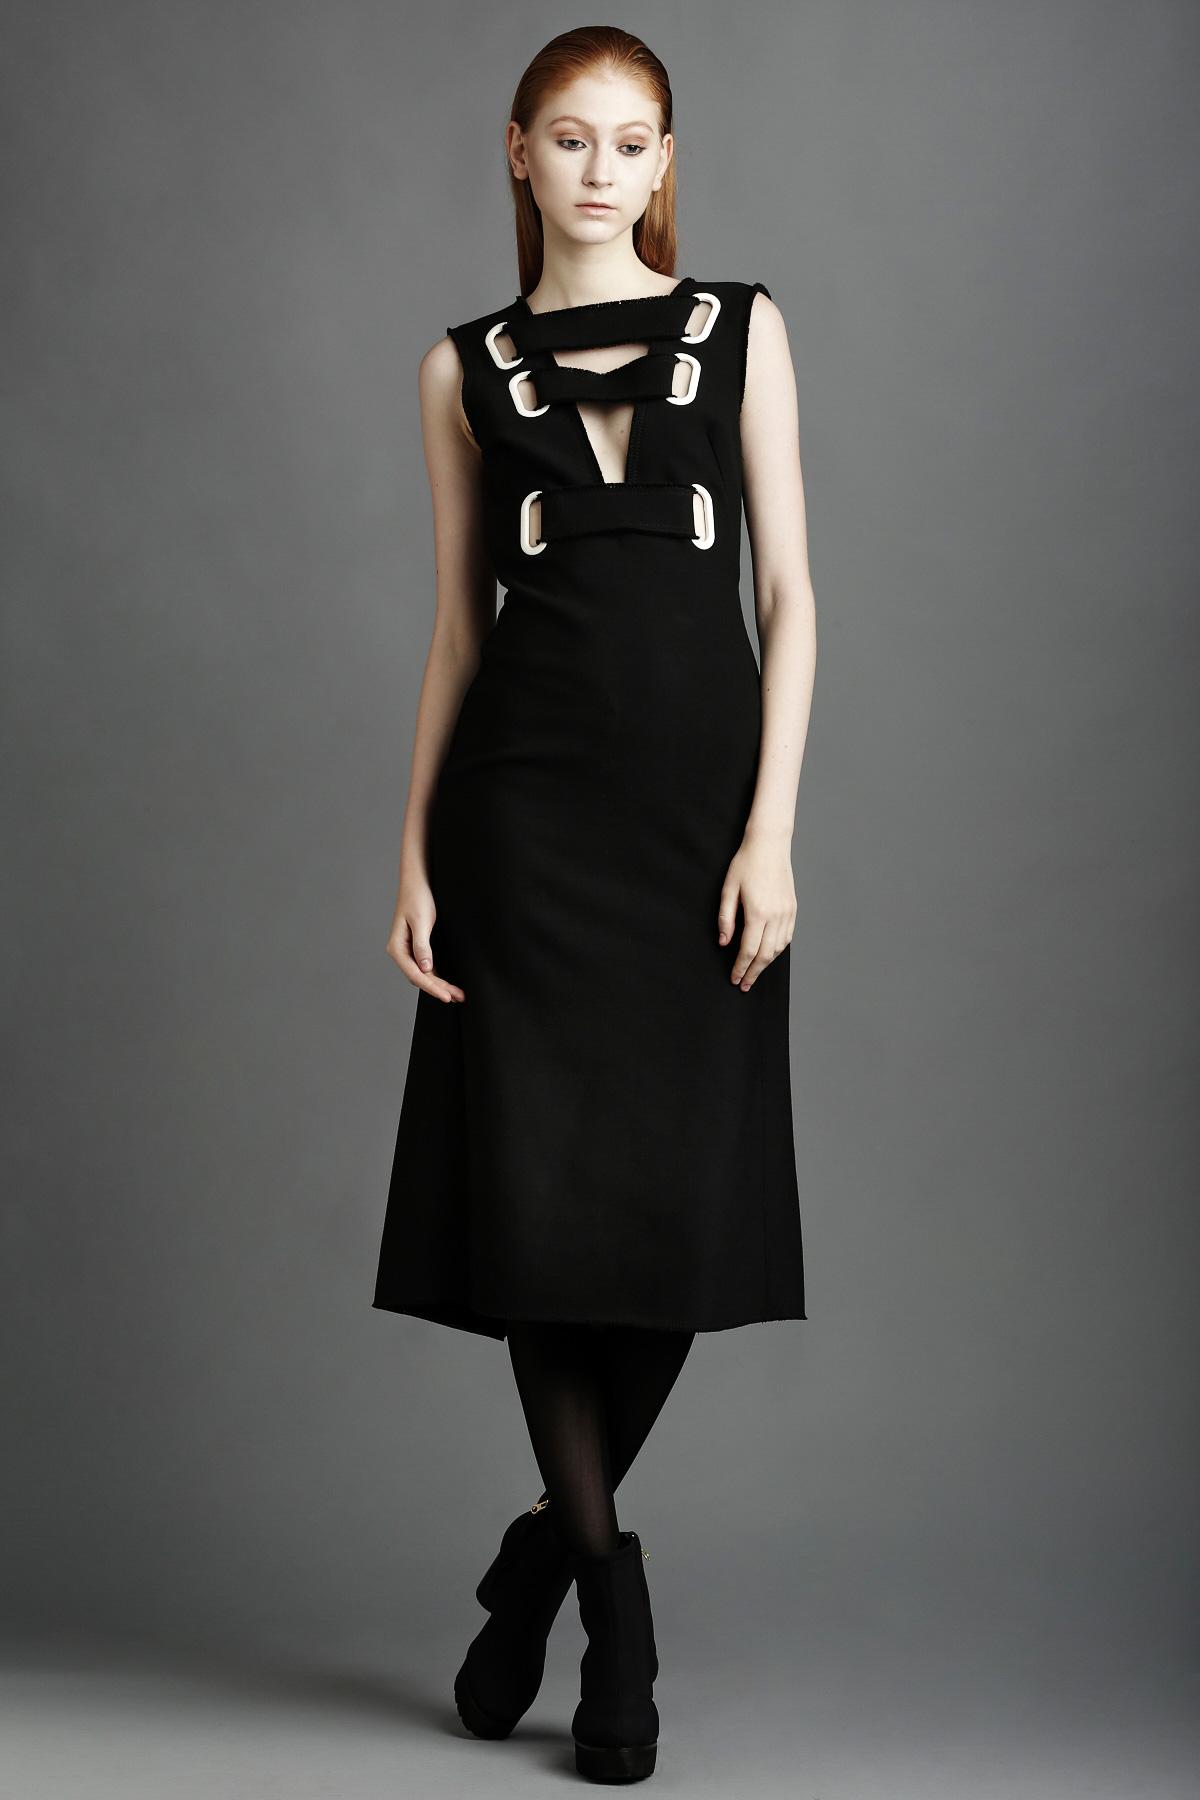 Yulia Kondranina Open Back Eyelet Striped Dress - WOMEN - OPENING CEREMONY